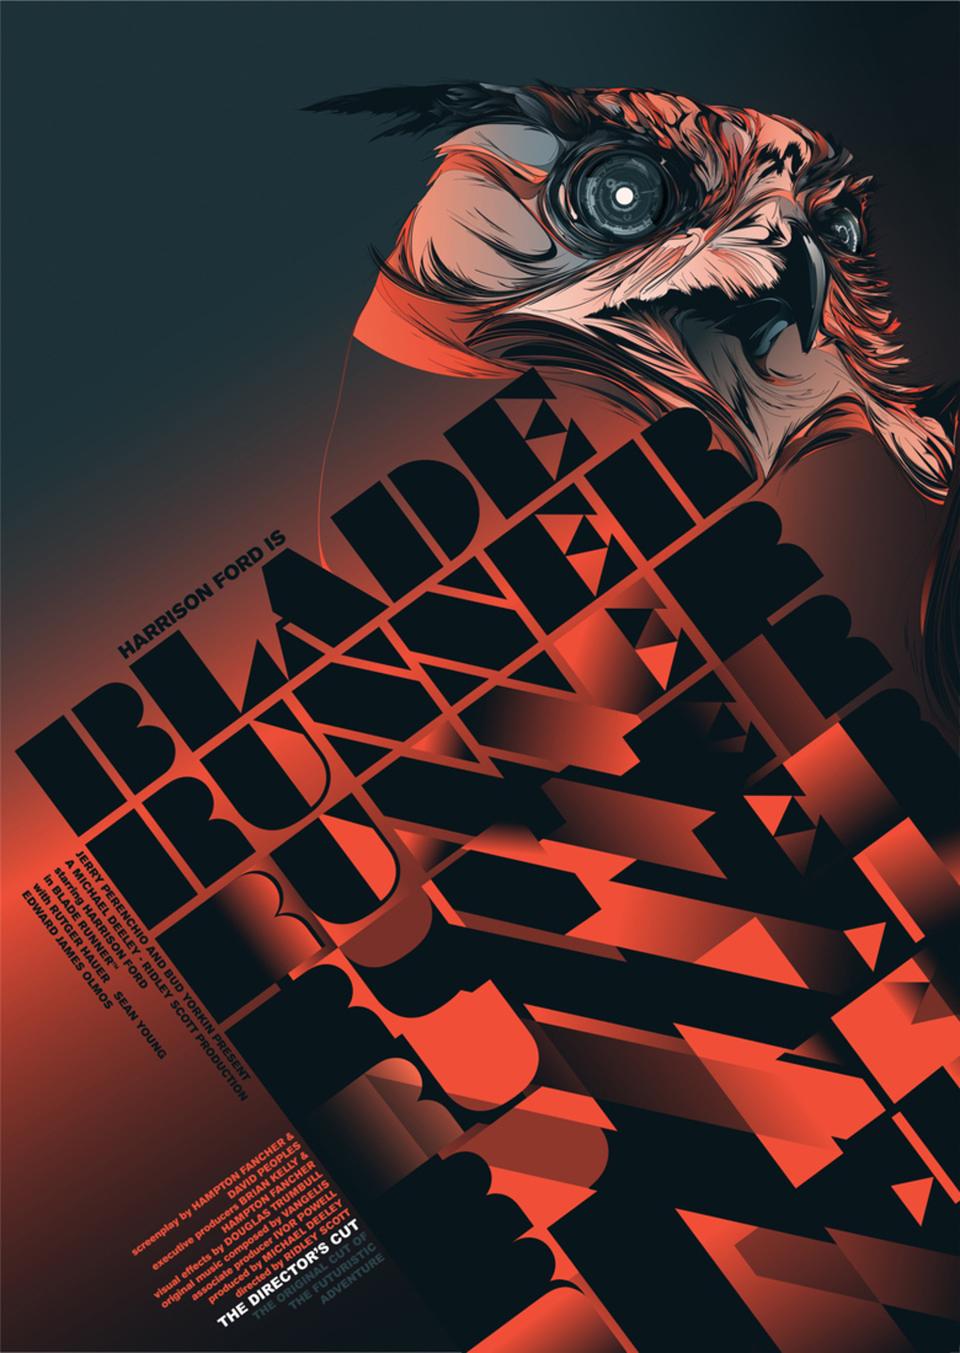 Blade_Runner_-_Kako_and_Carlos_Bela